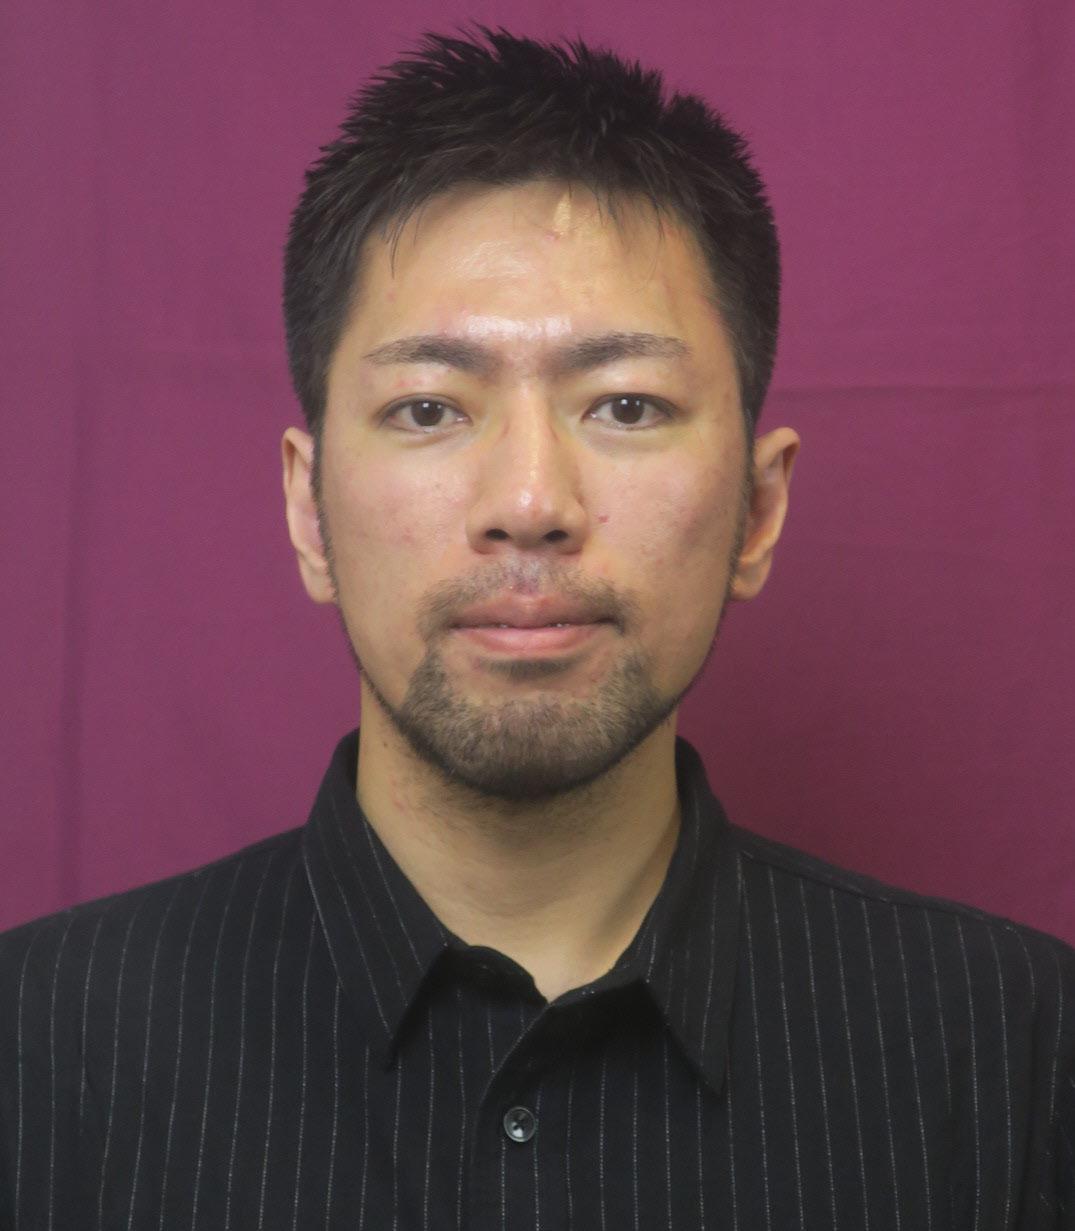 Masamu Kamaga, B.Eng., M.Eng., Ph.D